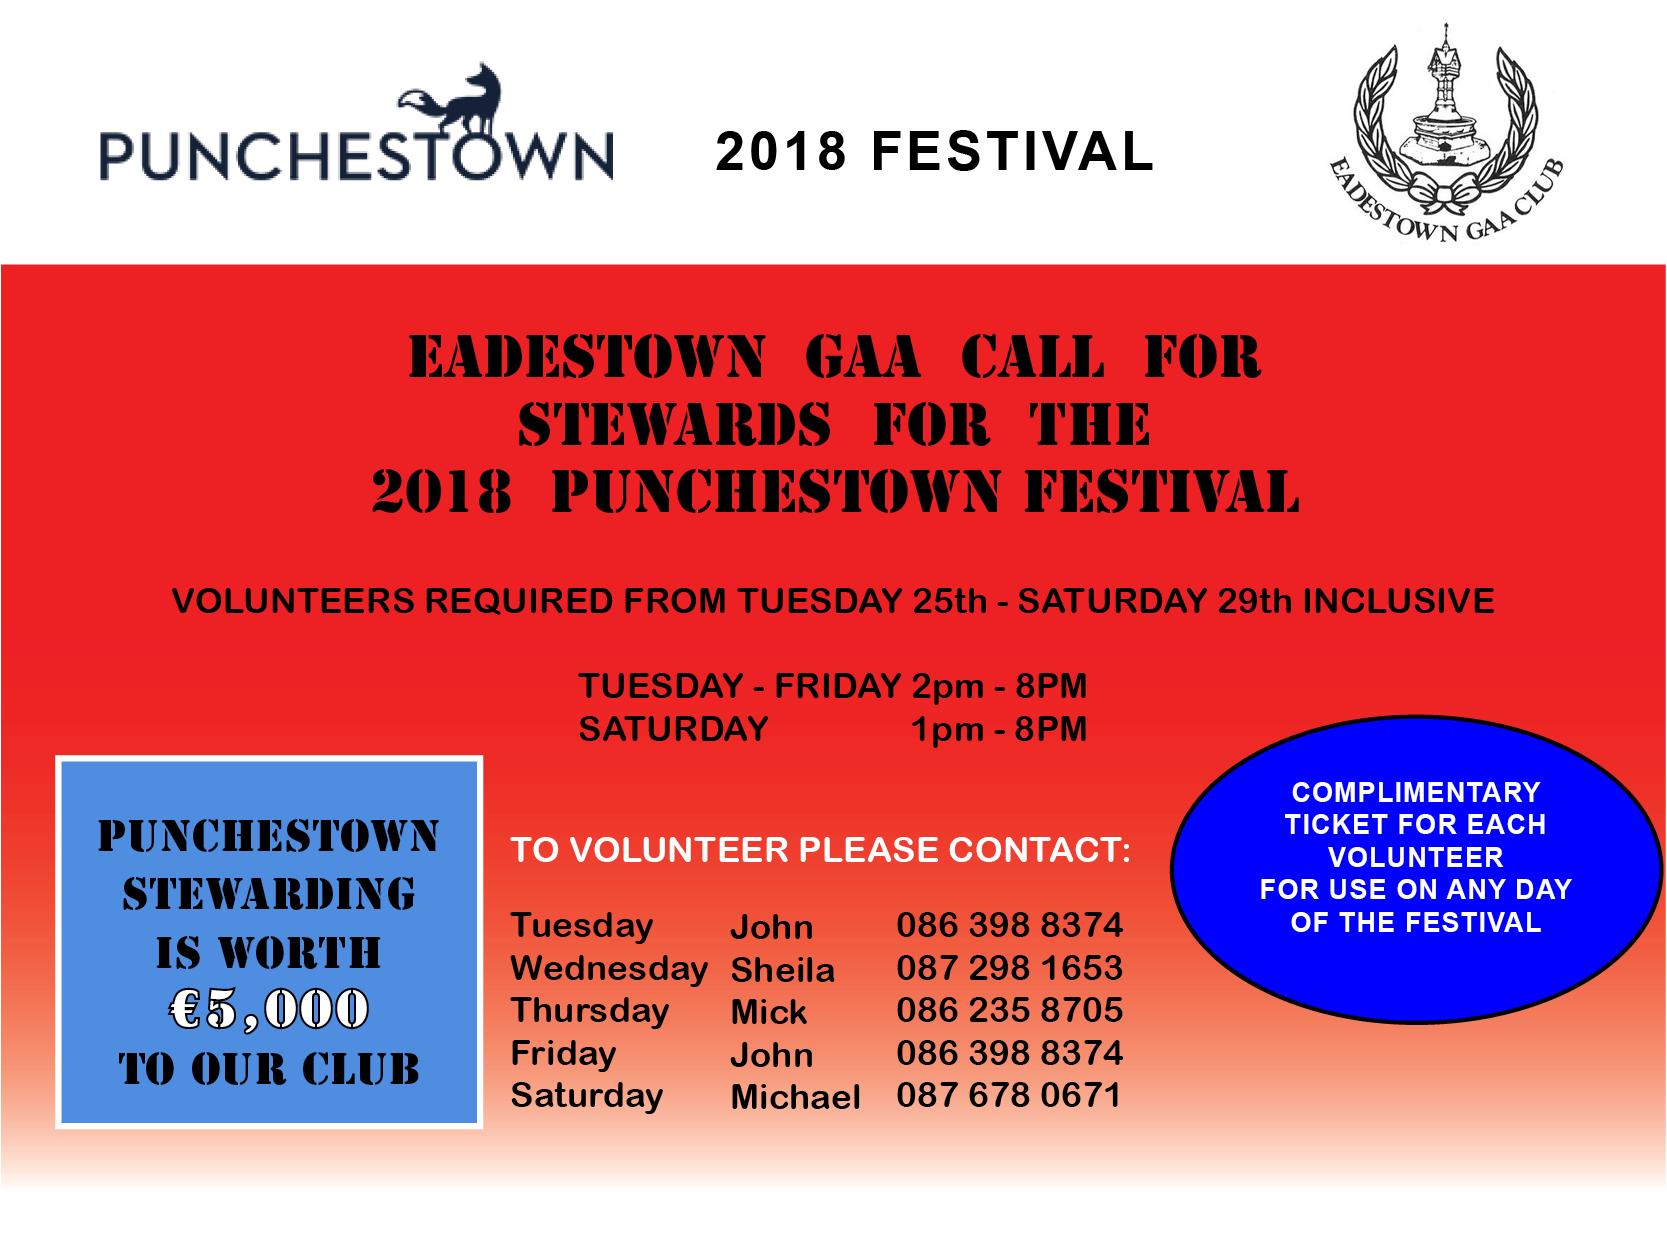 Punchestown 202018 20festival